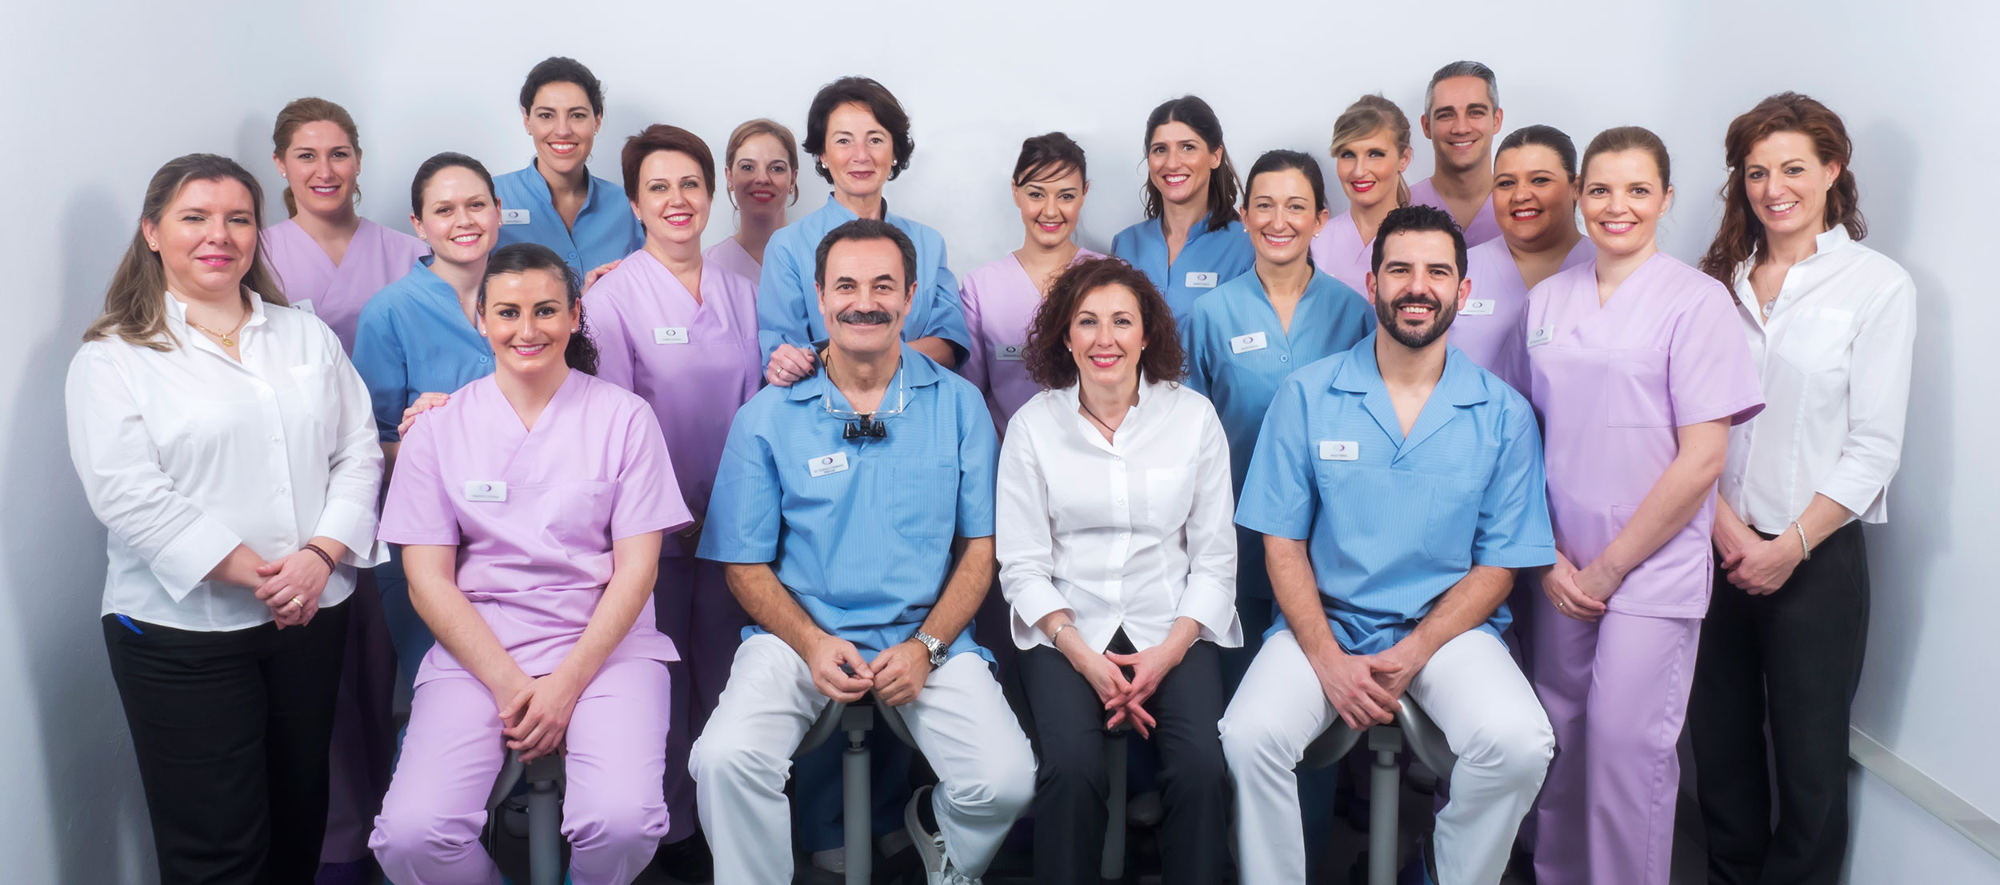 Equipo dentista en Sevilla